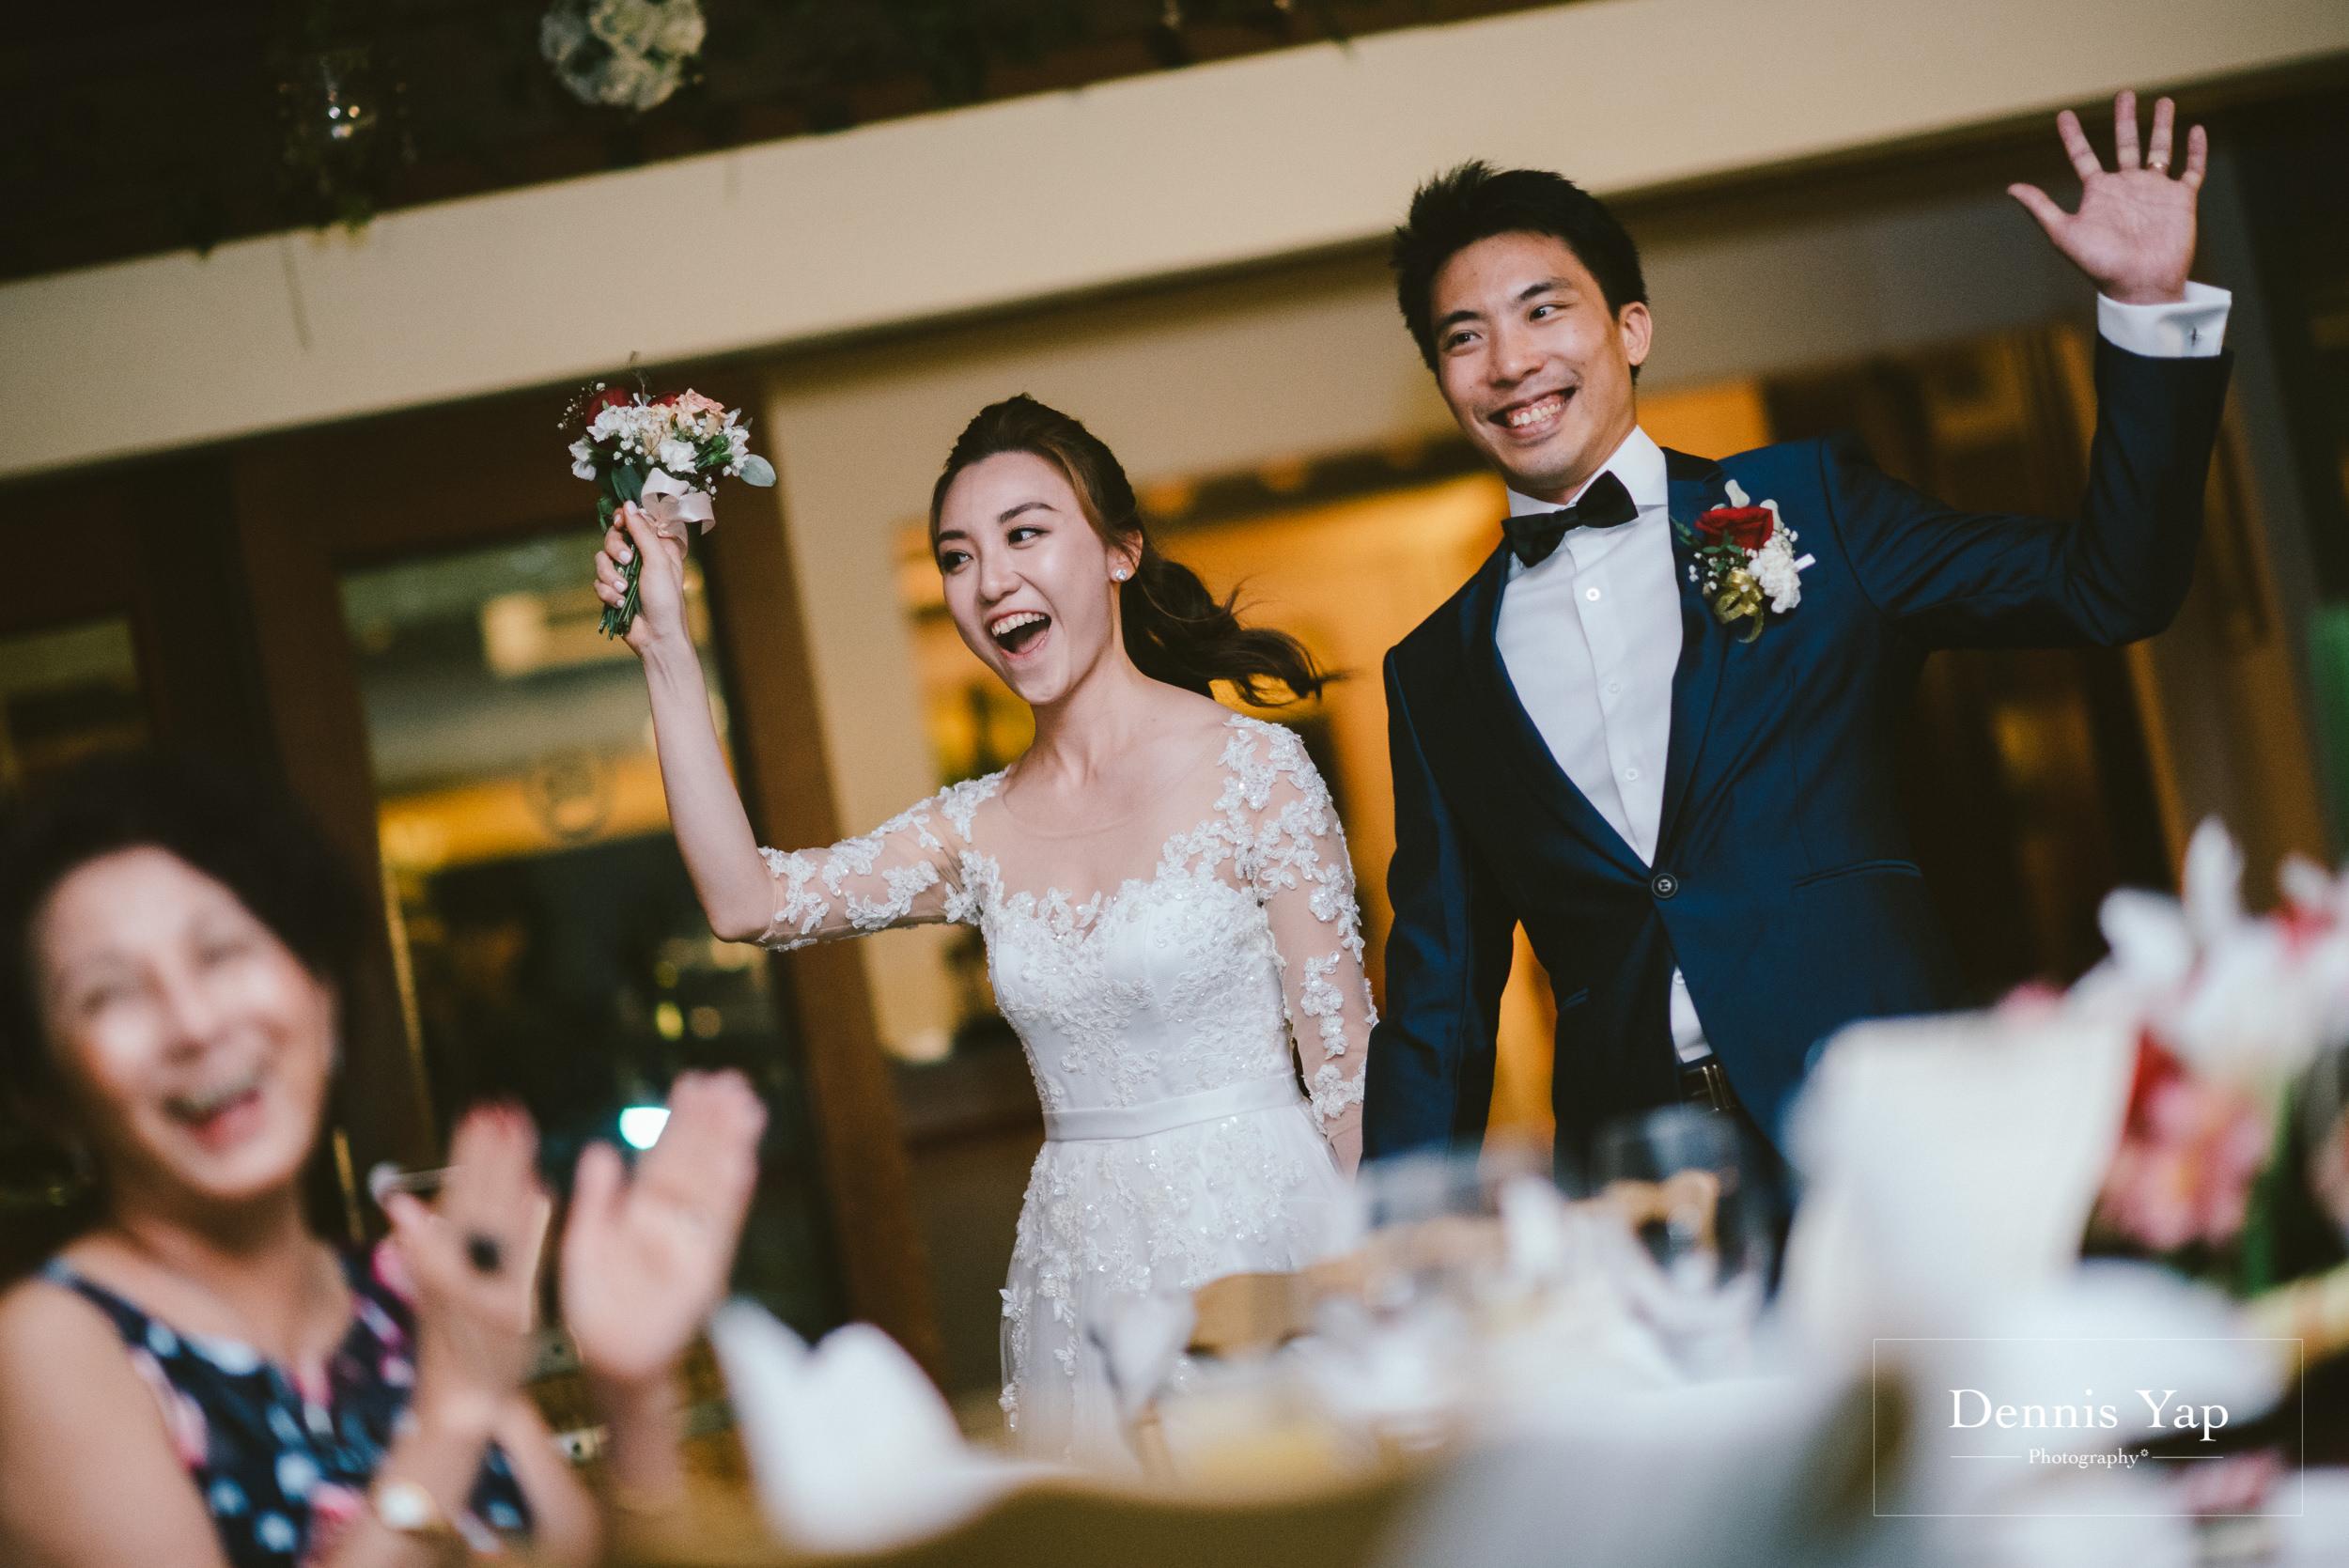 justin hsin wedding day ciao ristorante kuala lumpur dennis yap photography-33.jpg